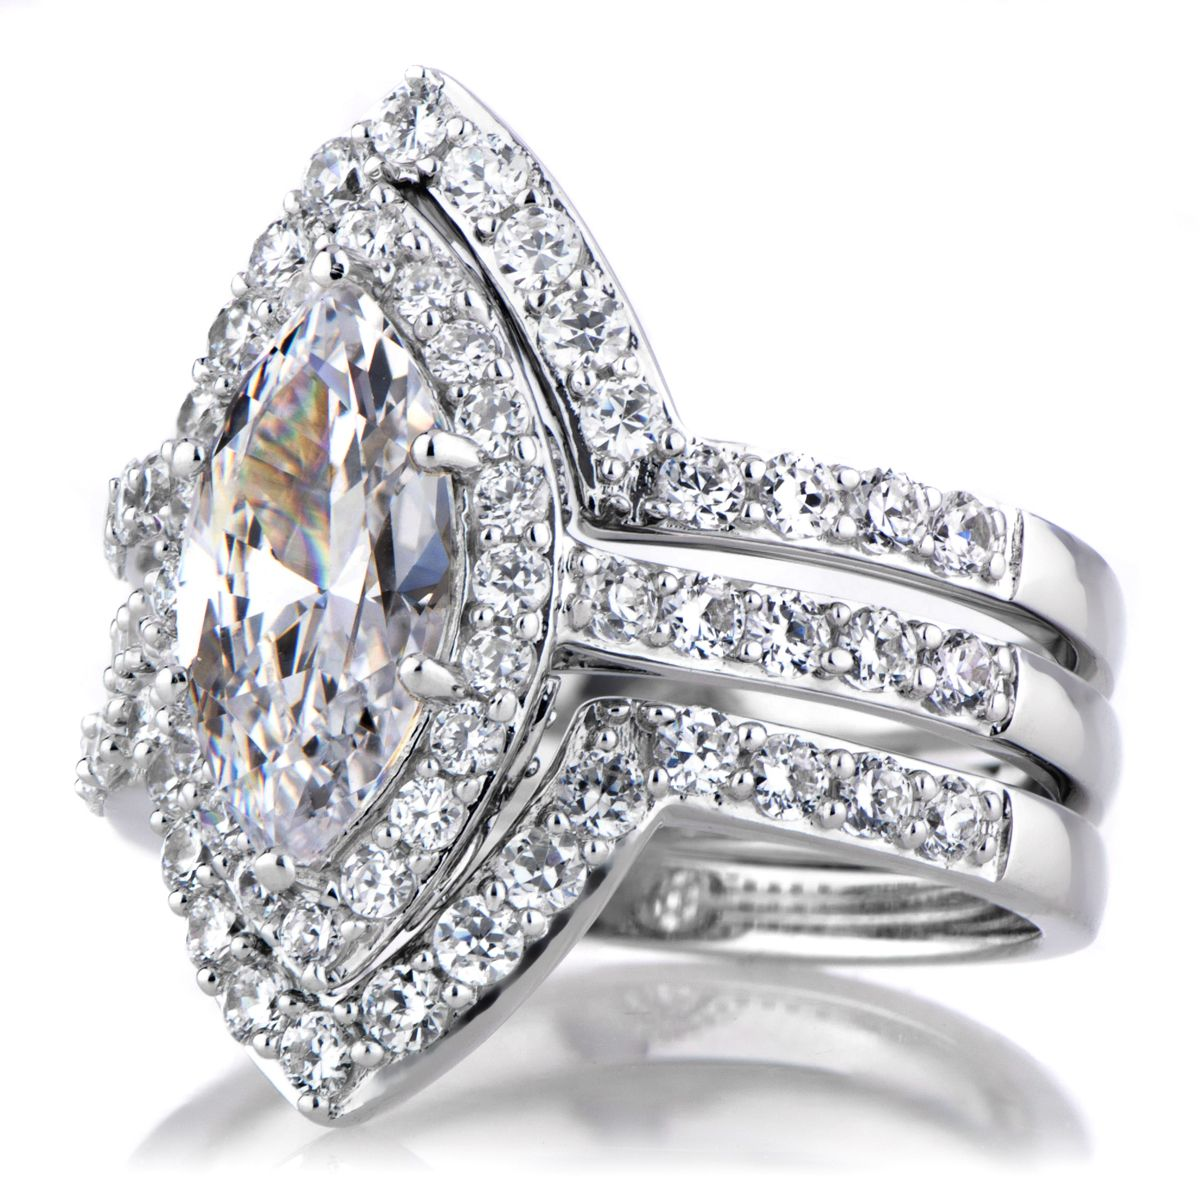 Pin by Lynn's Southern Heart on Bling   Diamond wedding ...